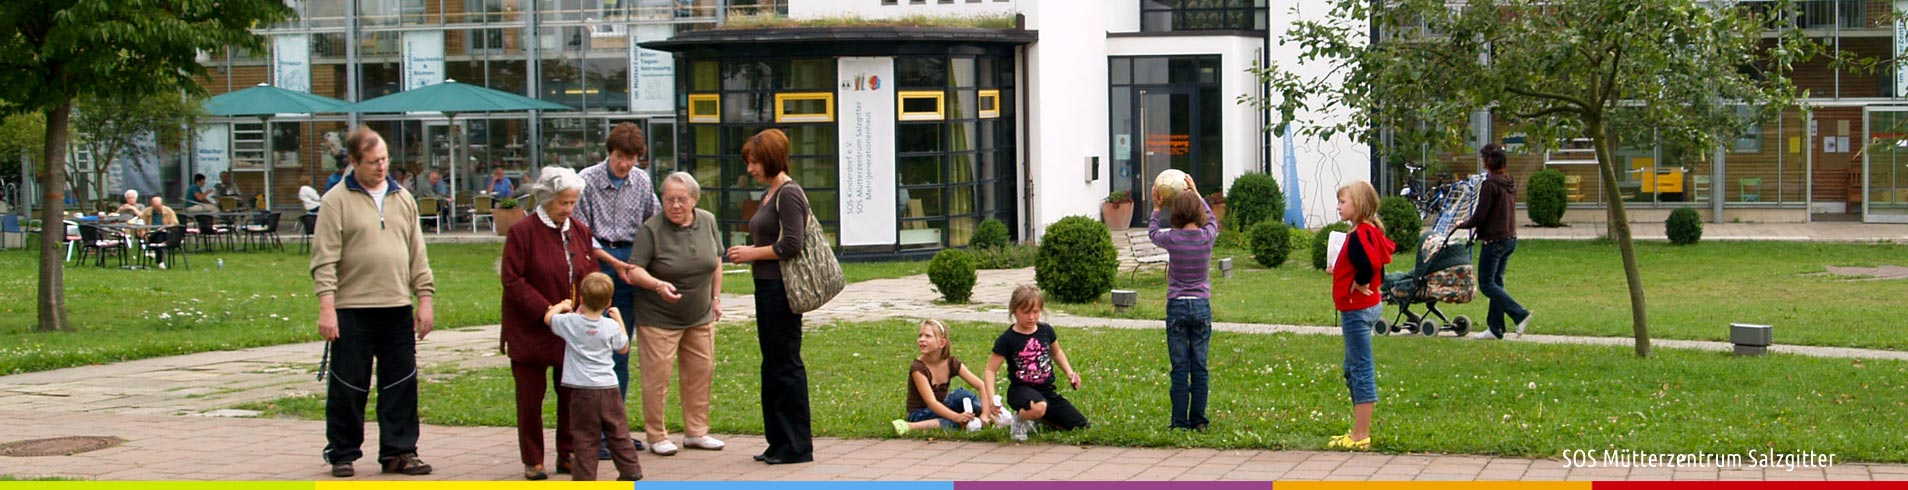 SOS Mütterzentrum Salzgitter